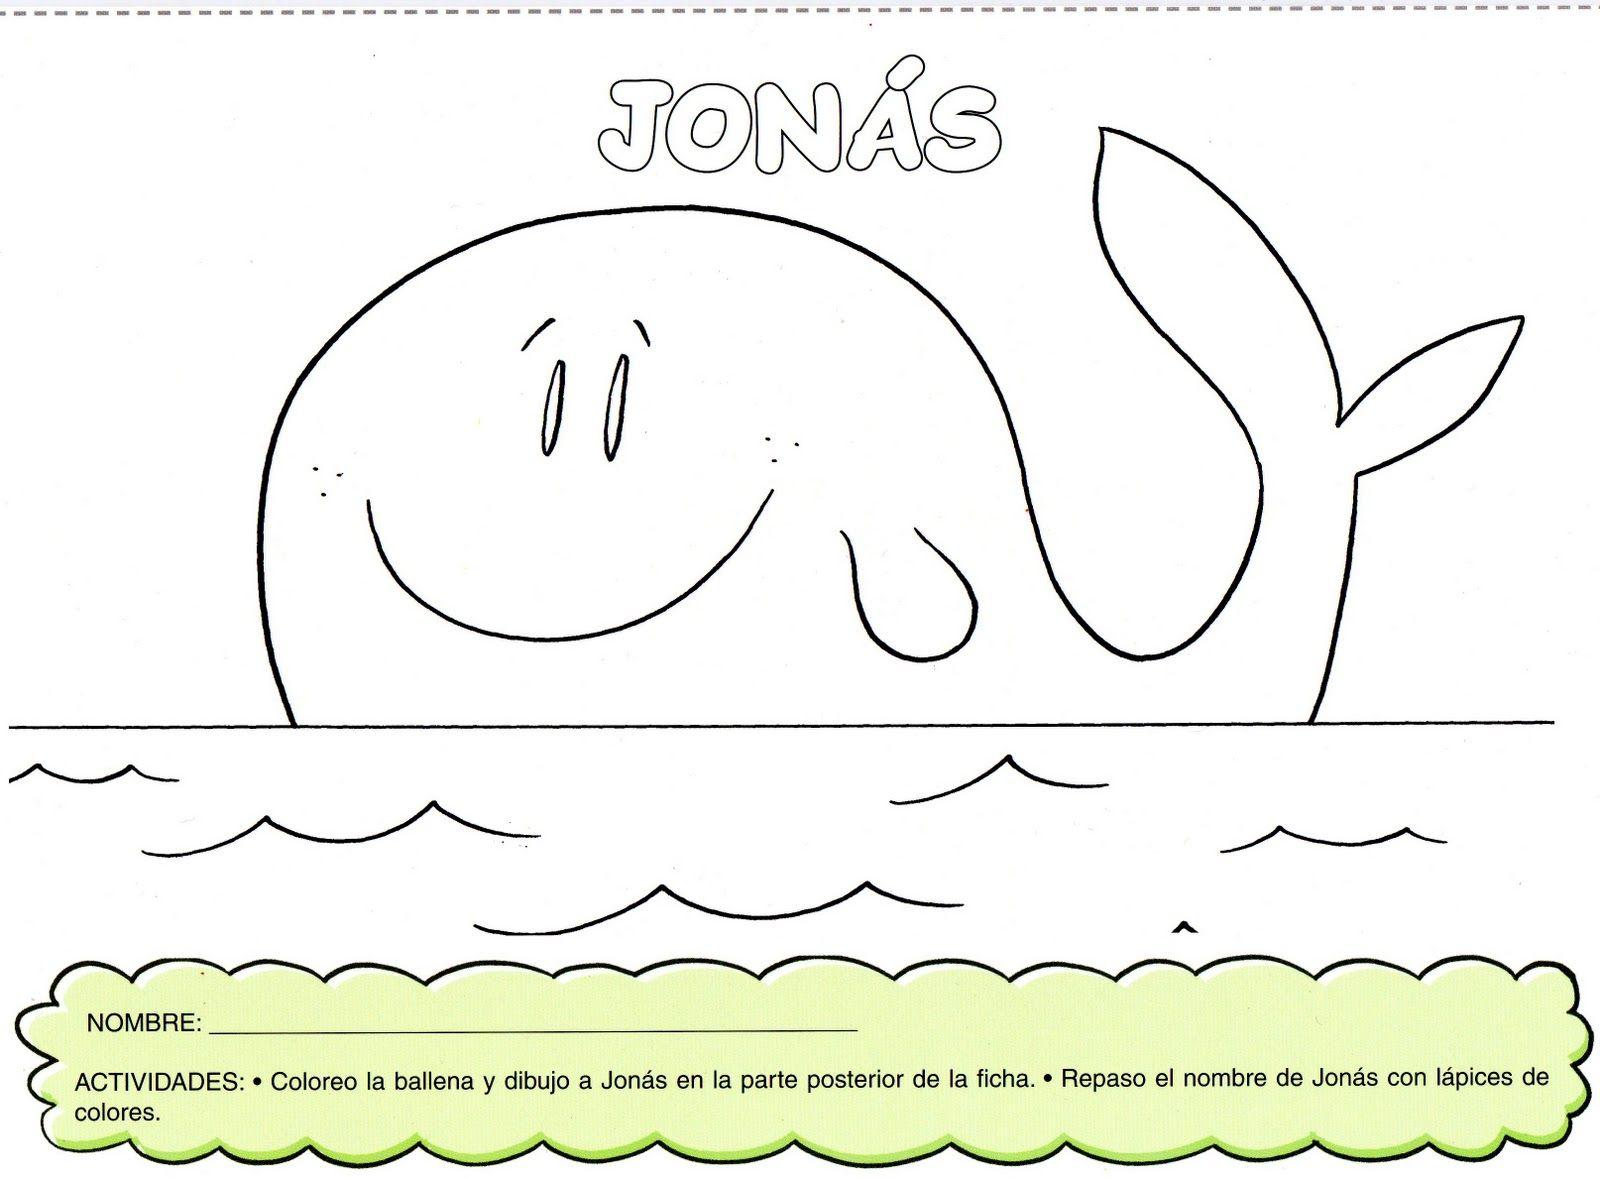 jonas y la ballena - Google Search | Hola Classroom | Pinterest | La ...